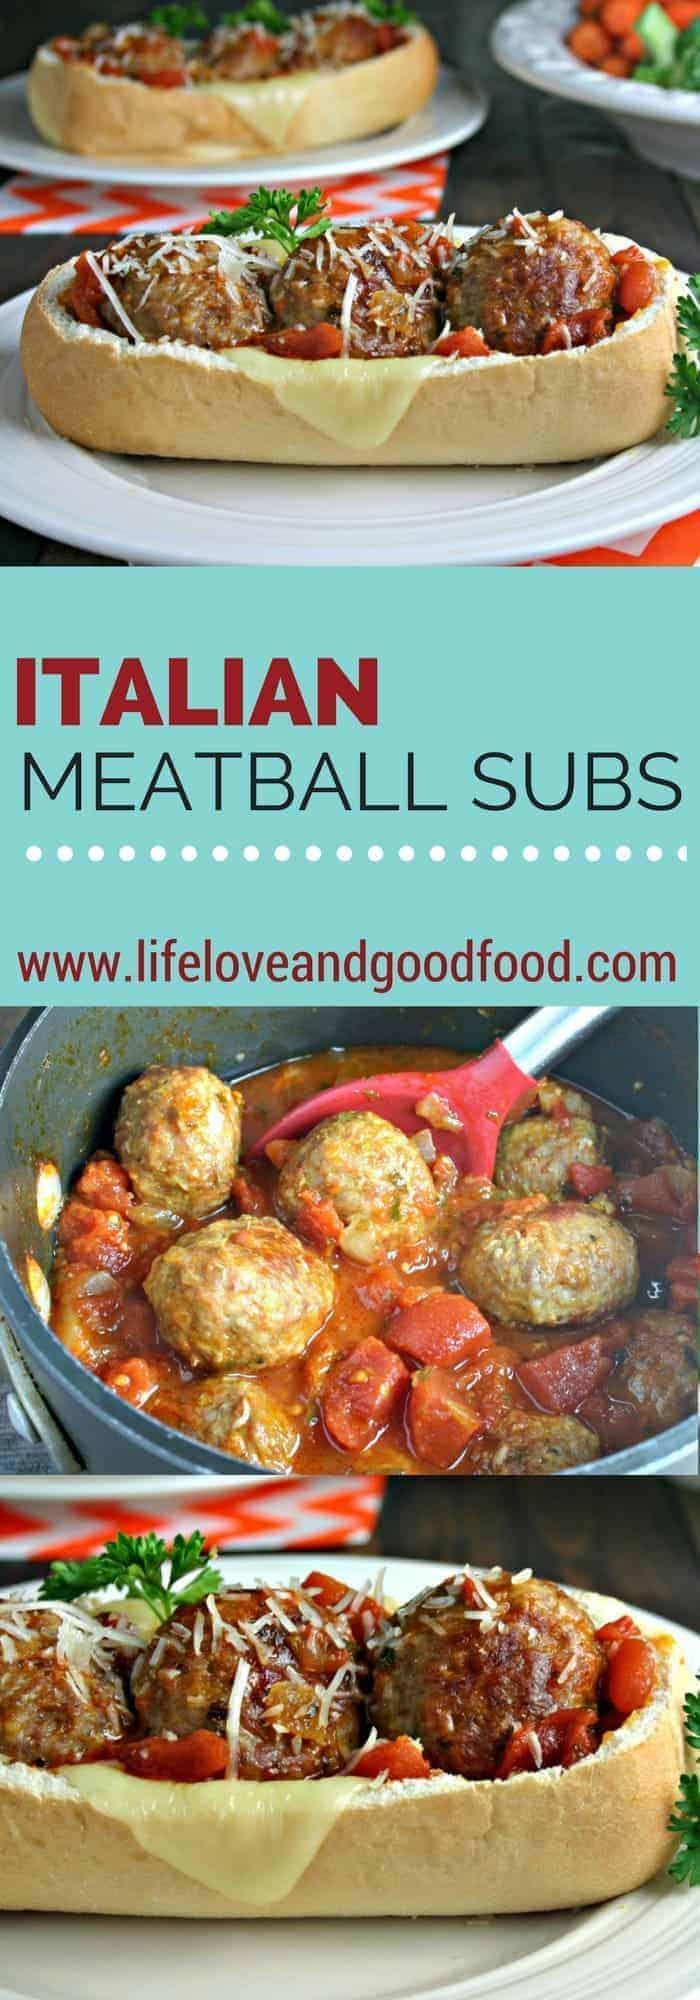 Italian Meatball Subs | Life, Love, and Good Food #Carando #sponsored